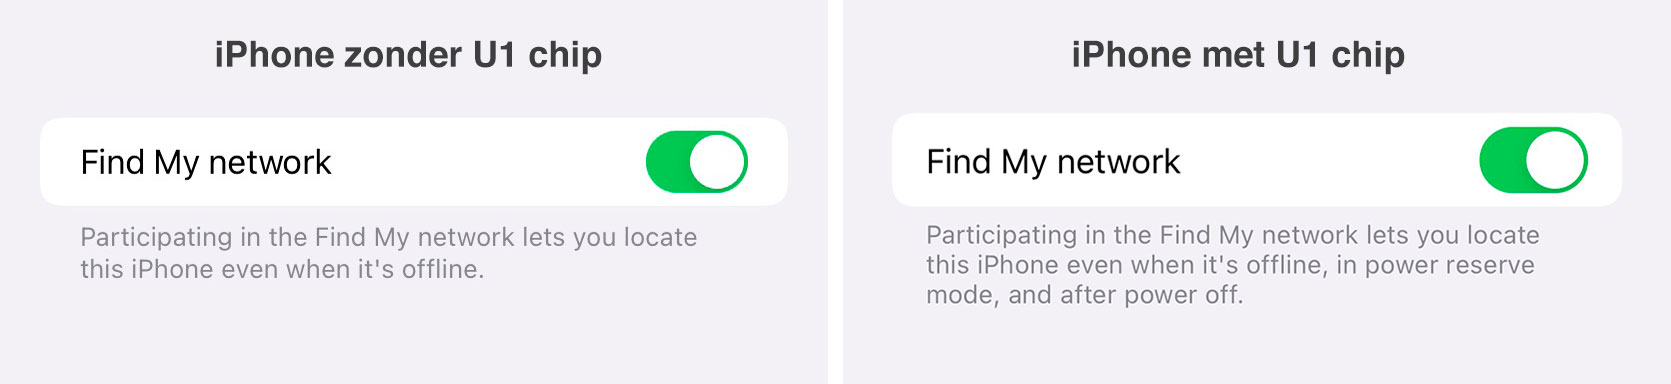 https://www.macfreak.nl/modules/news/images/zArt.iOS15iPhoneFindMySetting.jpg